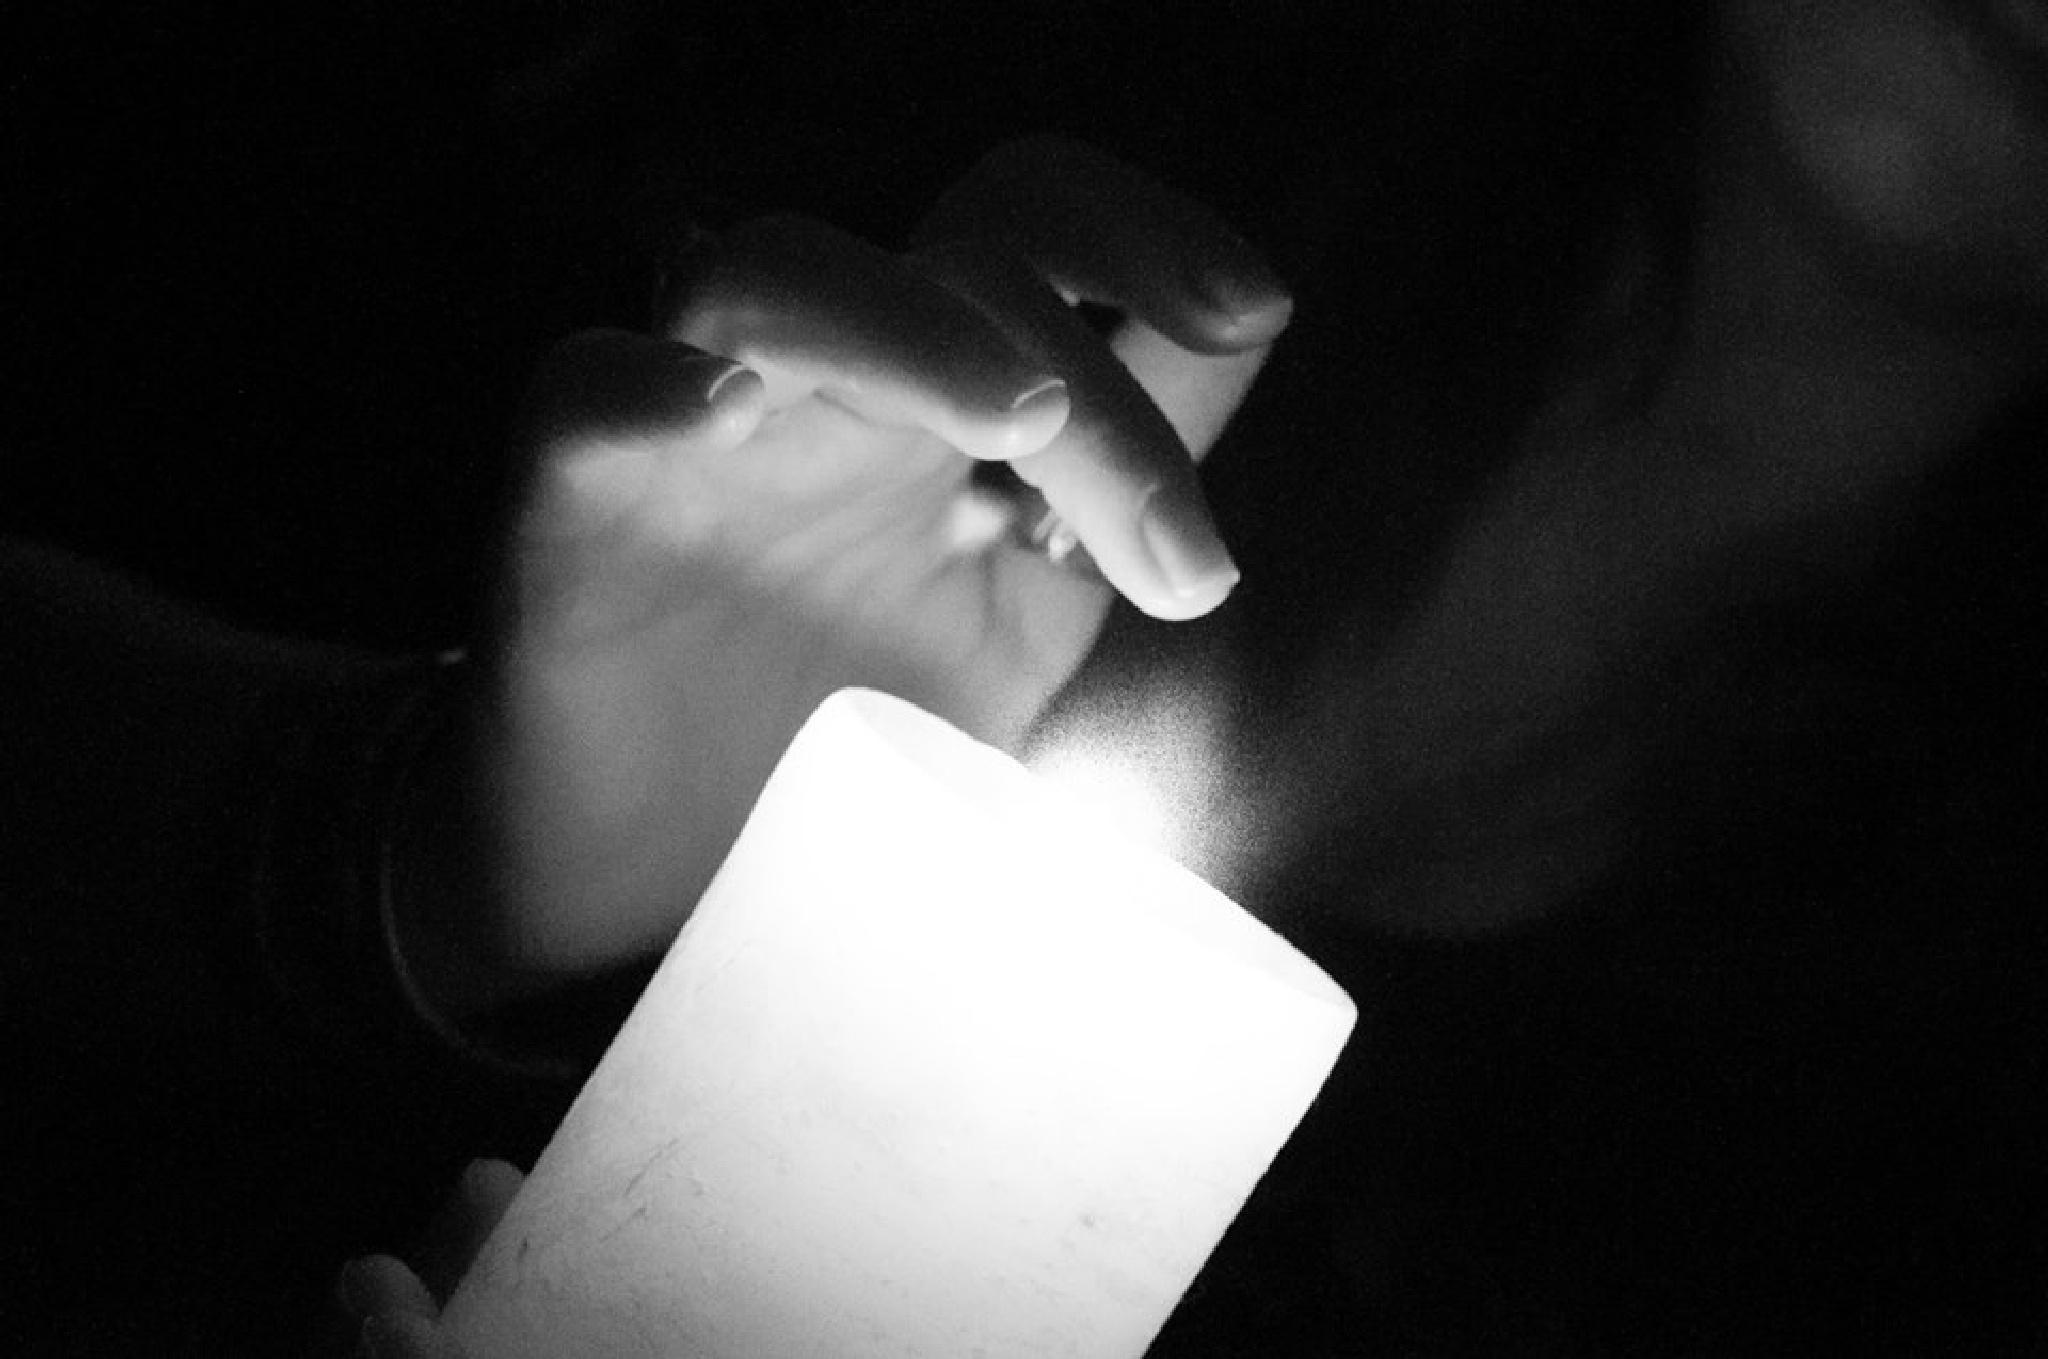 Magic of light by Kate Loran